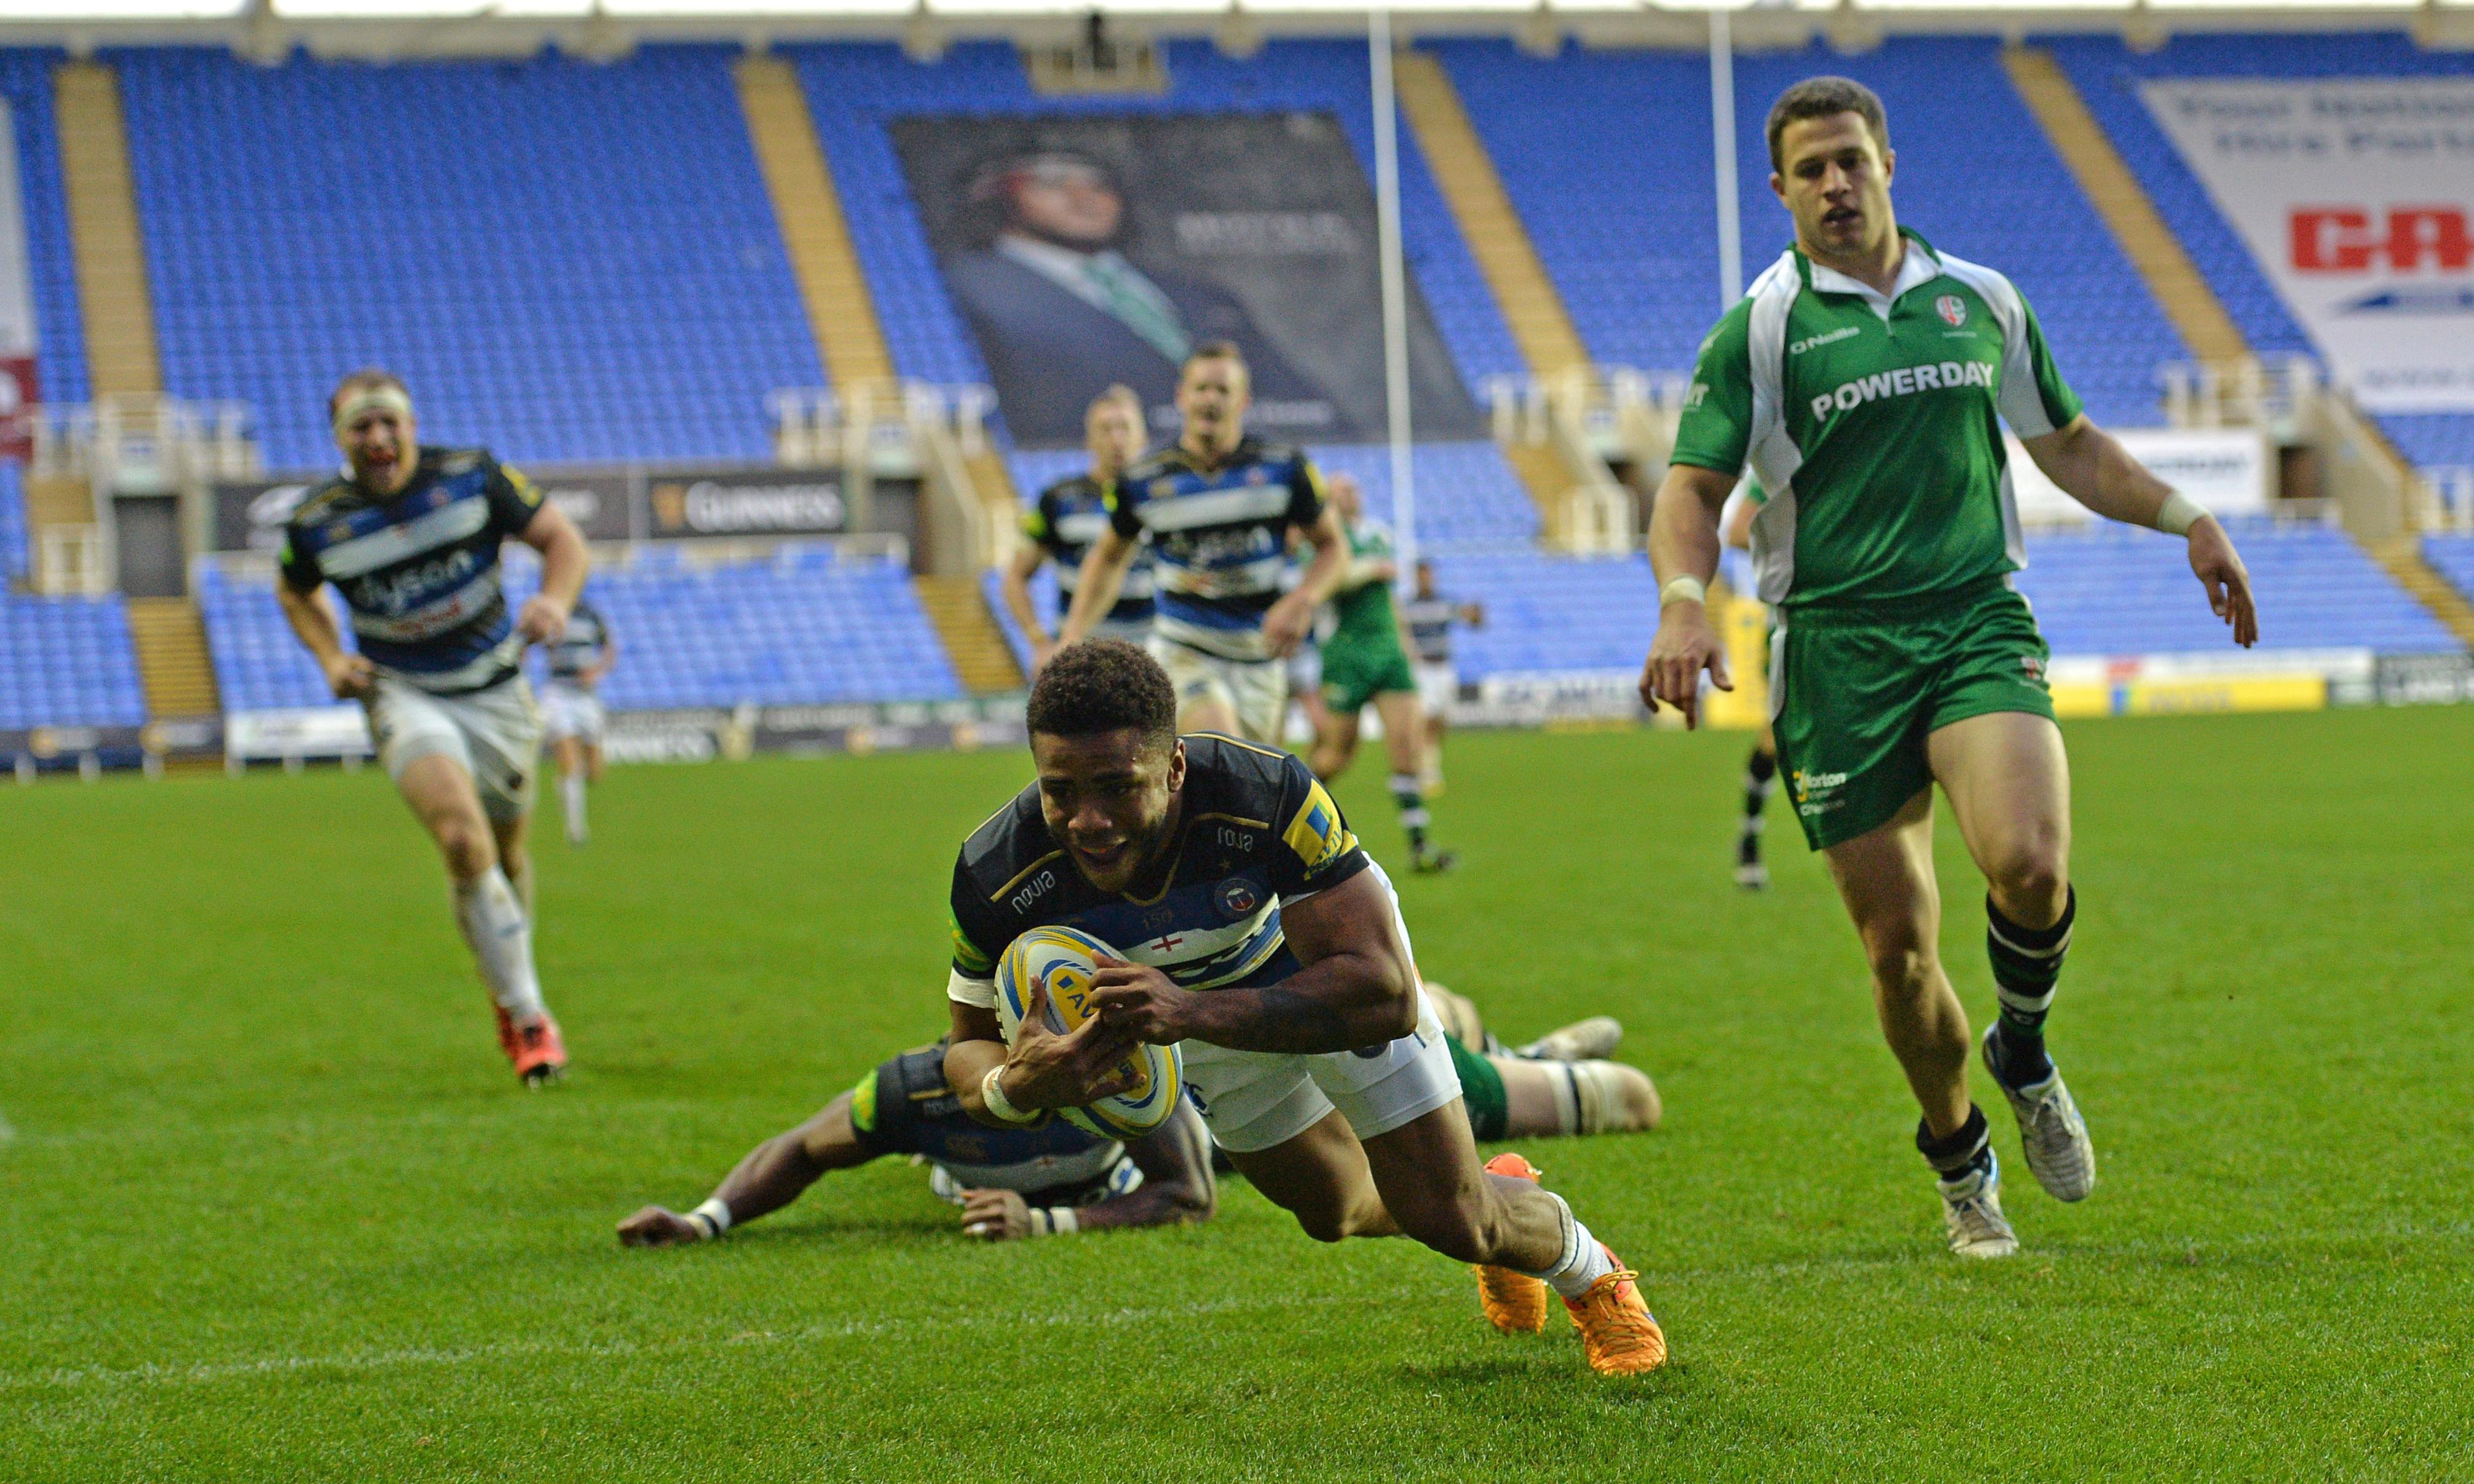 London Irish to leave Madejski and share with Brentford at new stadium